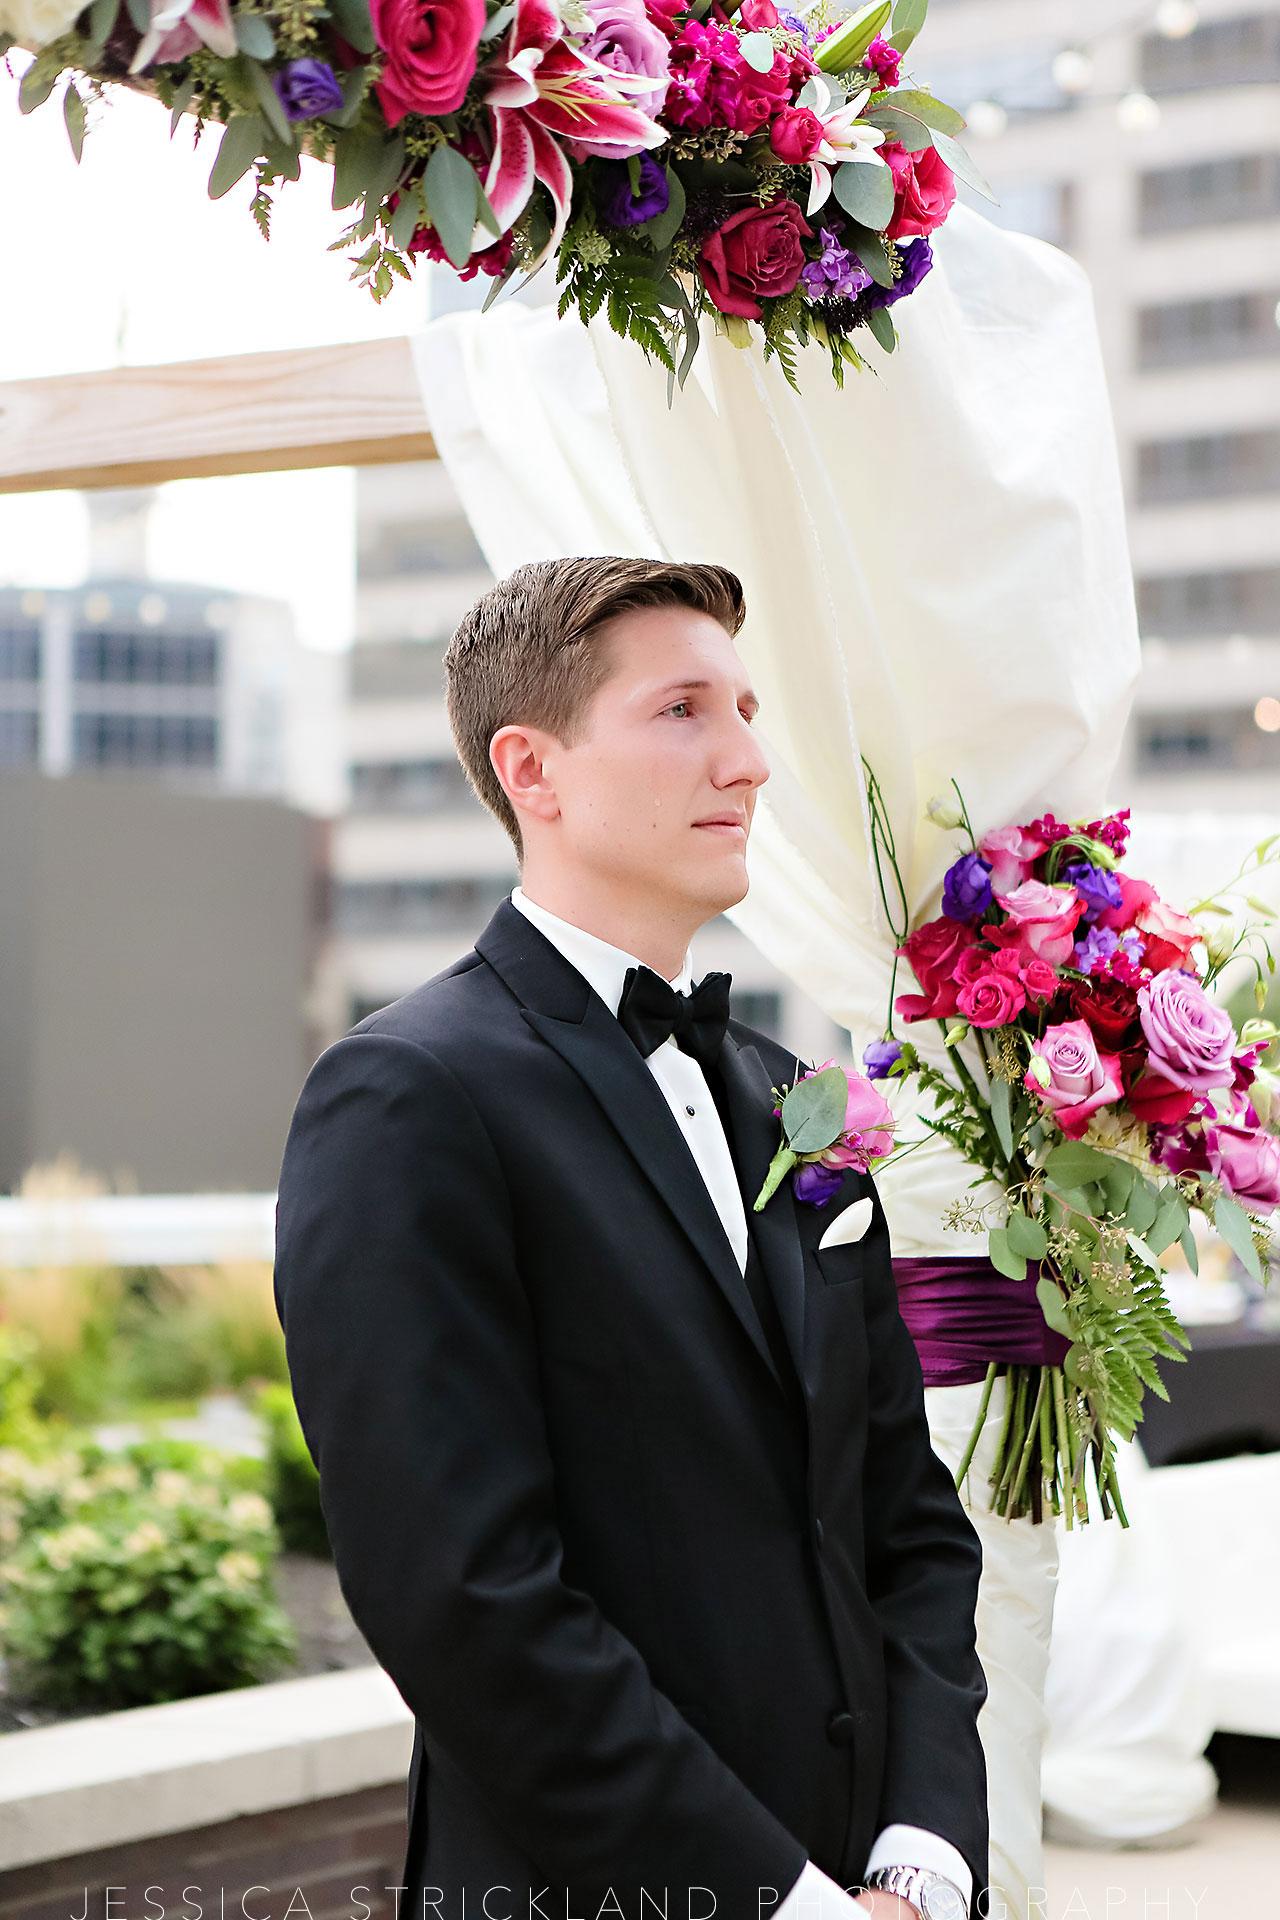 Serra Alex Regions Tower Indianapolis Wedding 155 watermarked